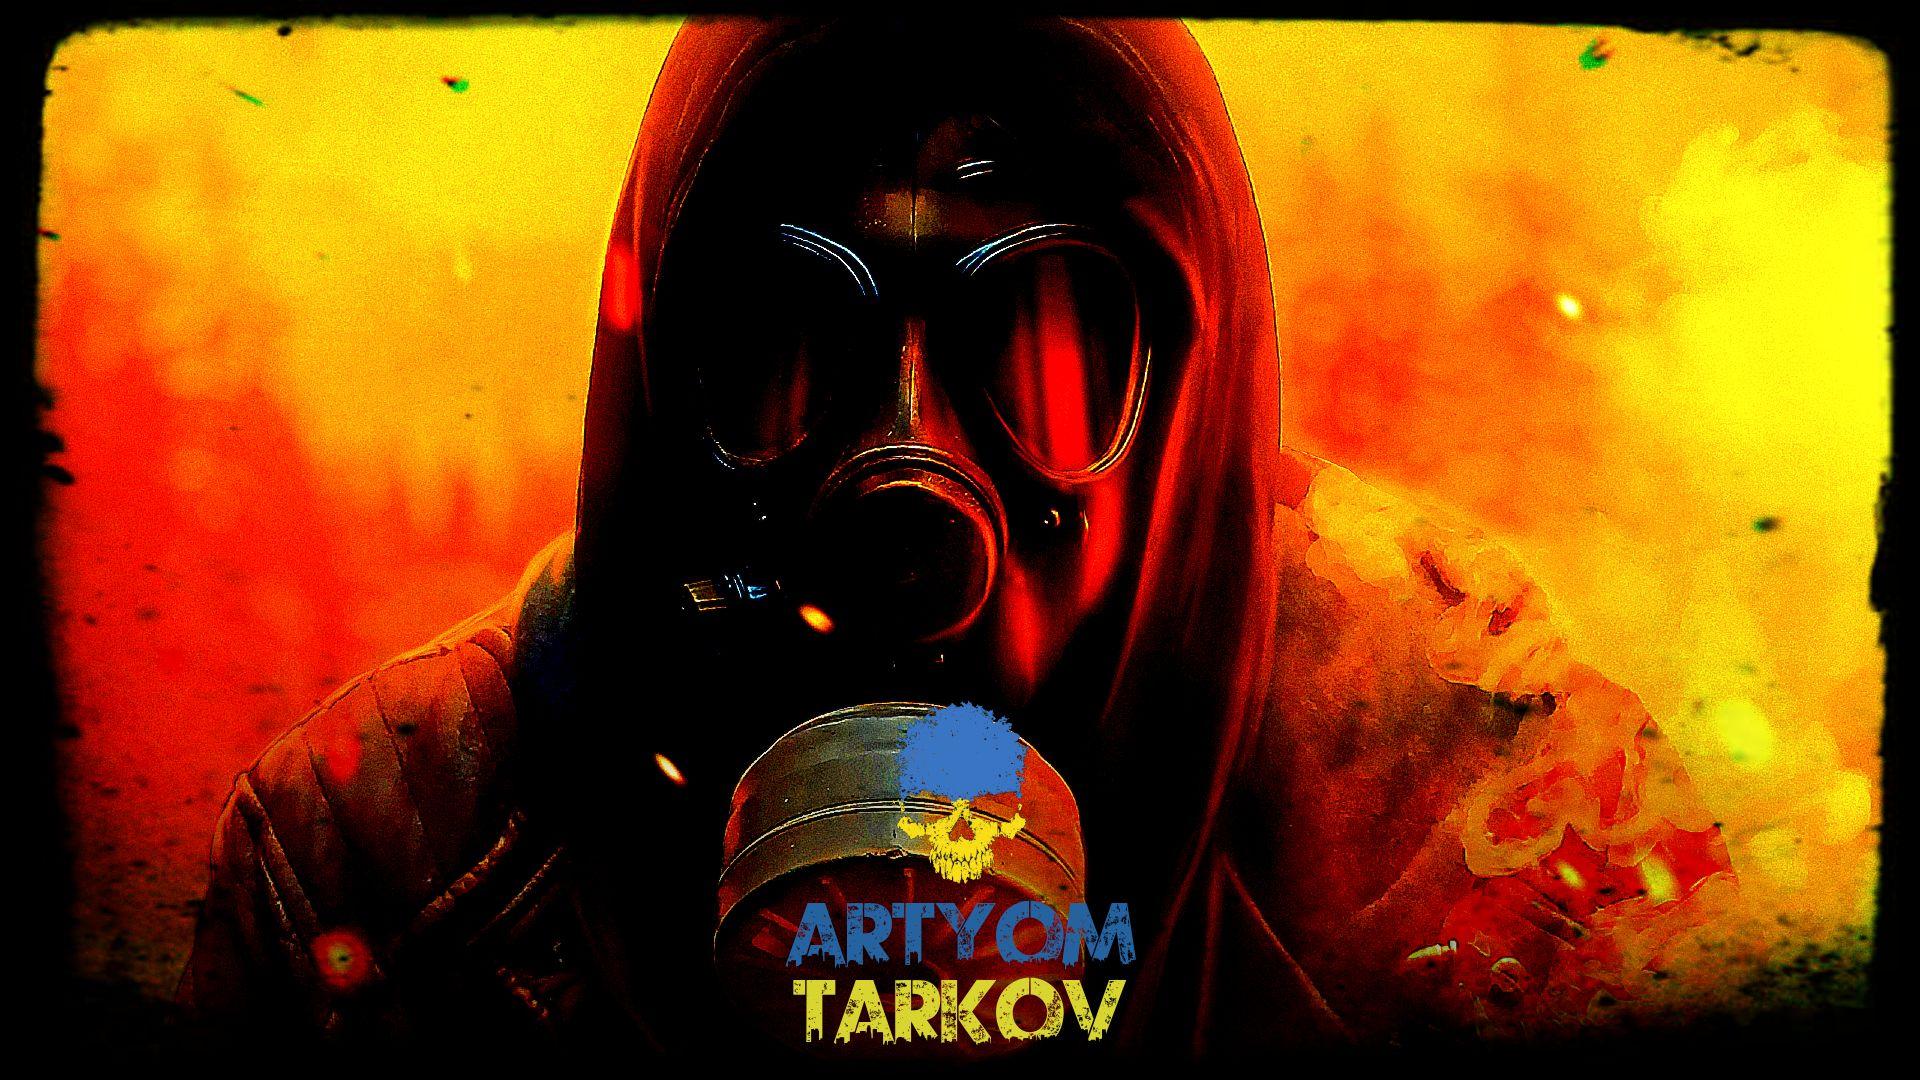 Arty_Tarkov_Wallpaper_UA.jpg.ff8d60ffaea395d9a258cce7704fec15.jpg